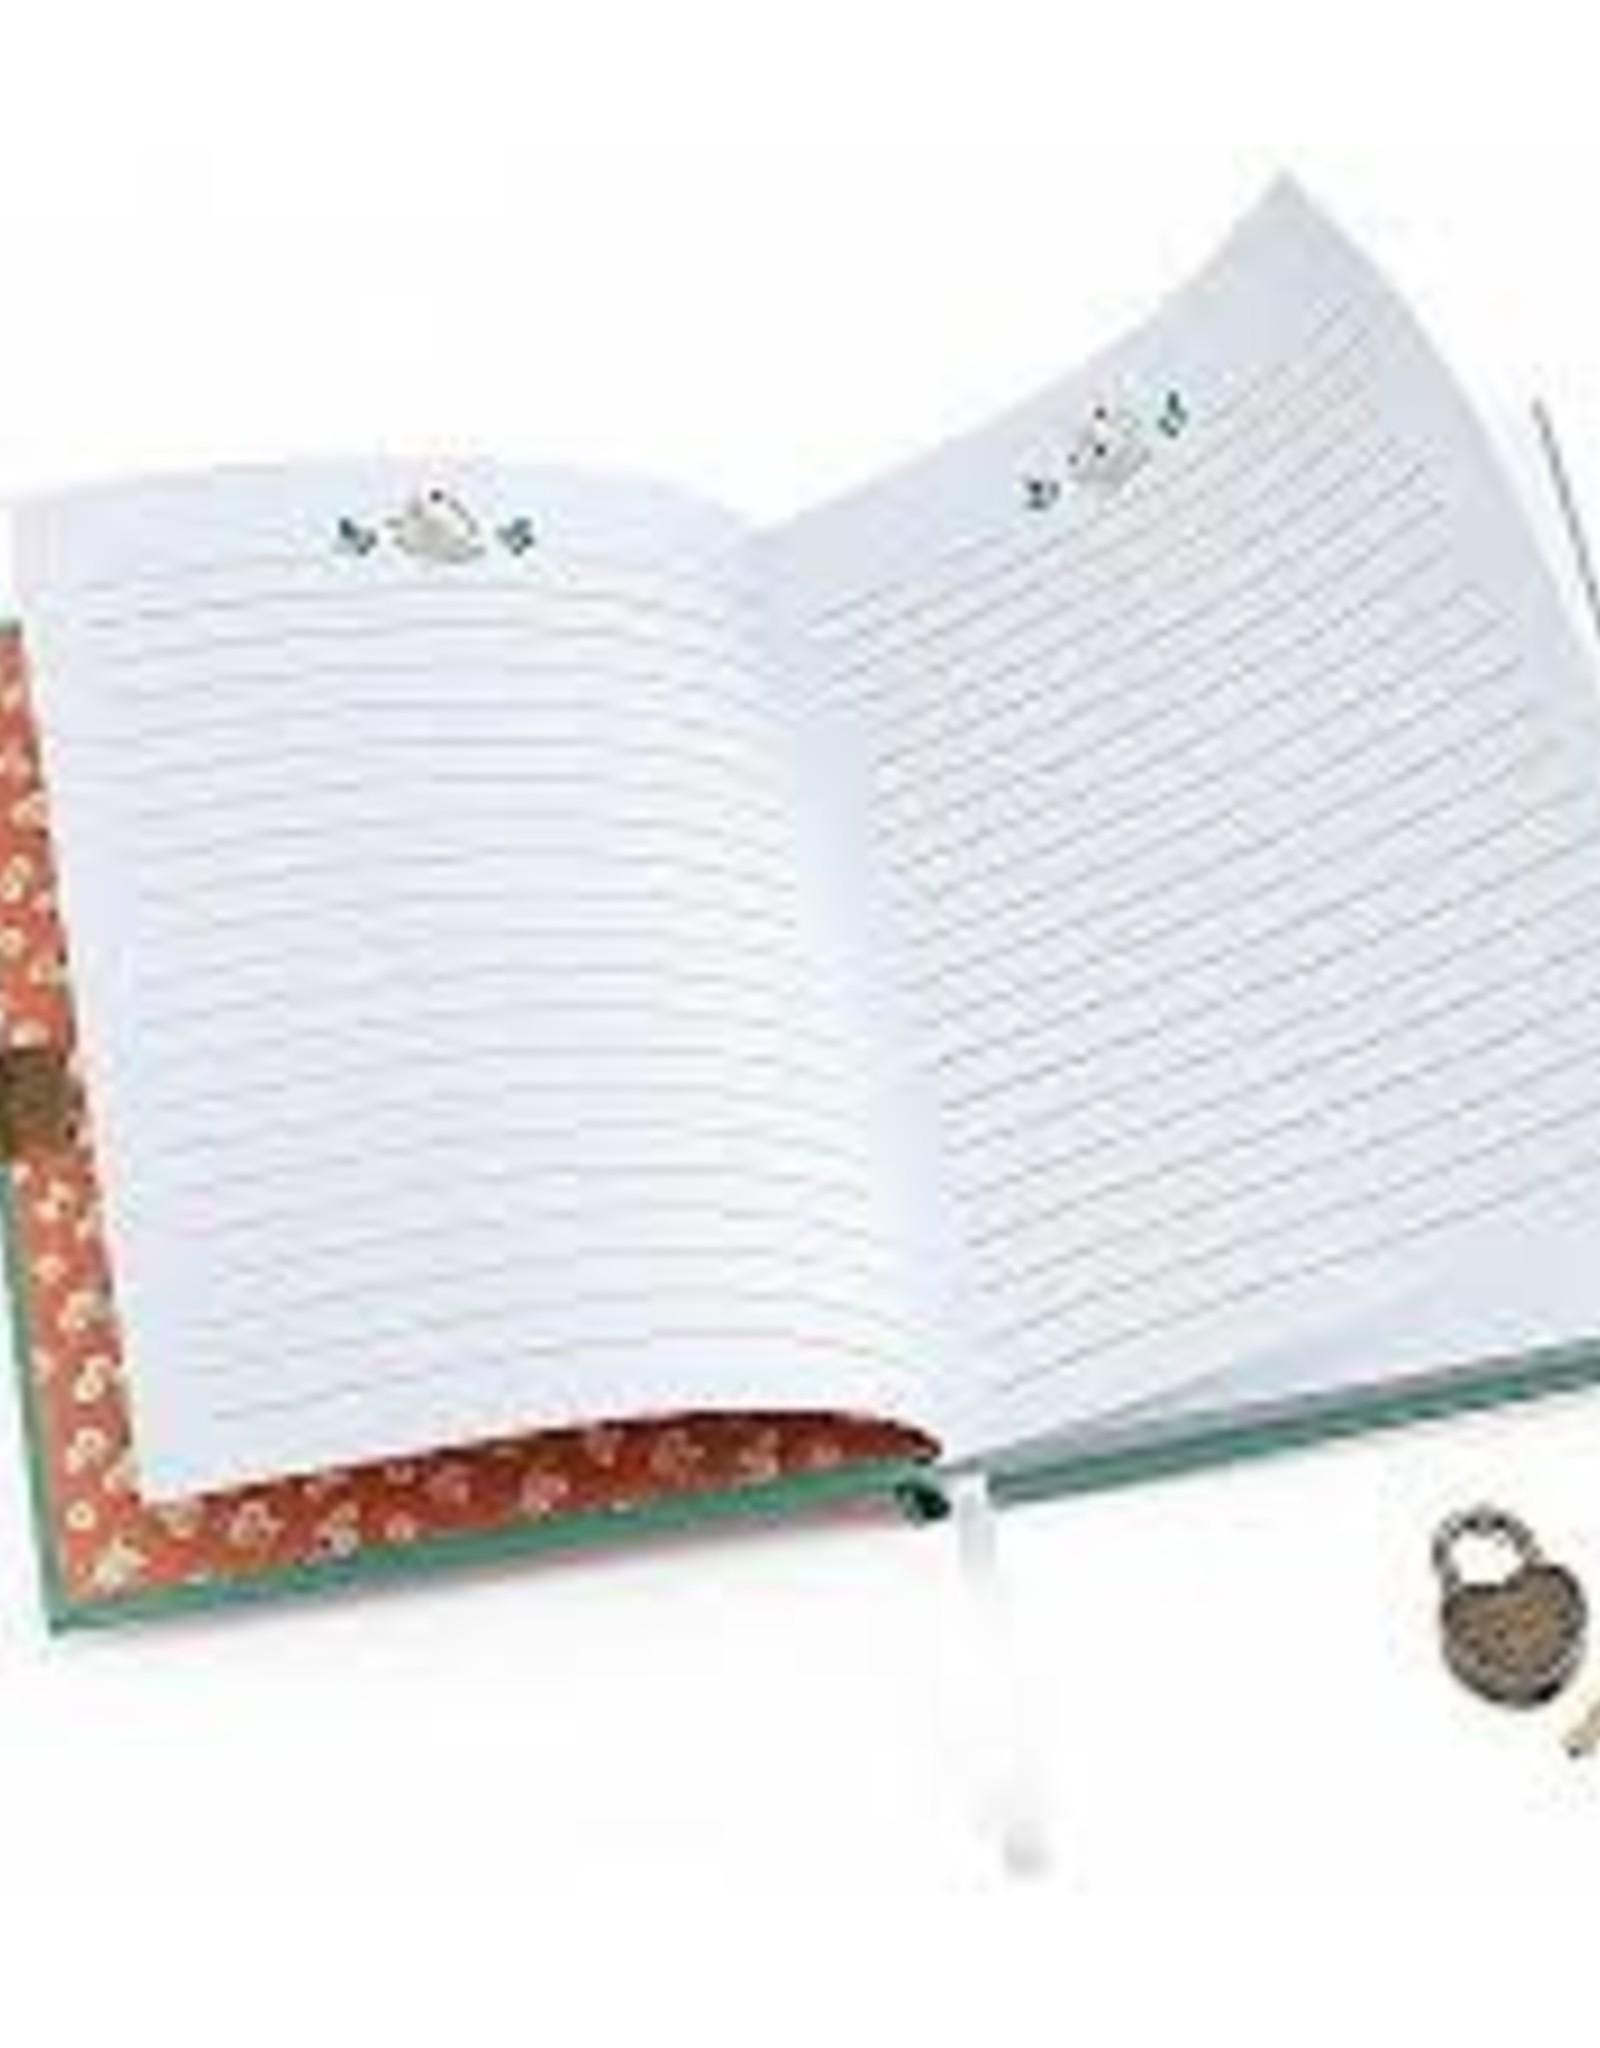 DJECO Secret Journal - Lucille